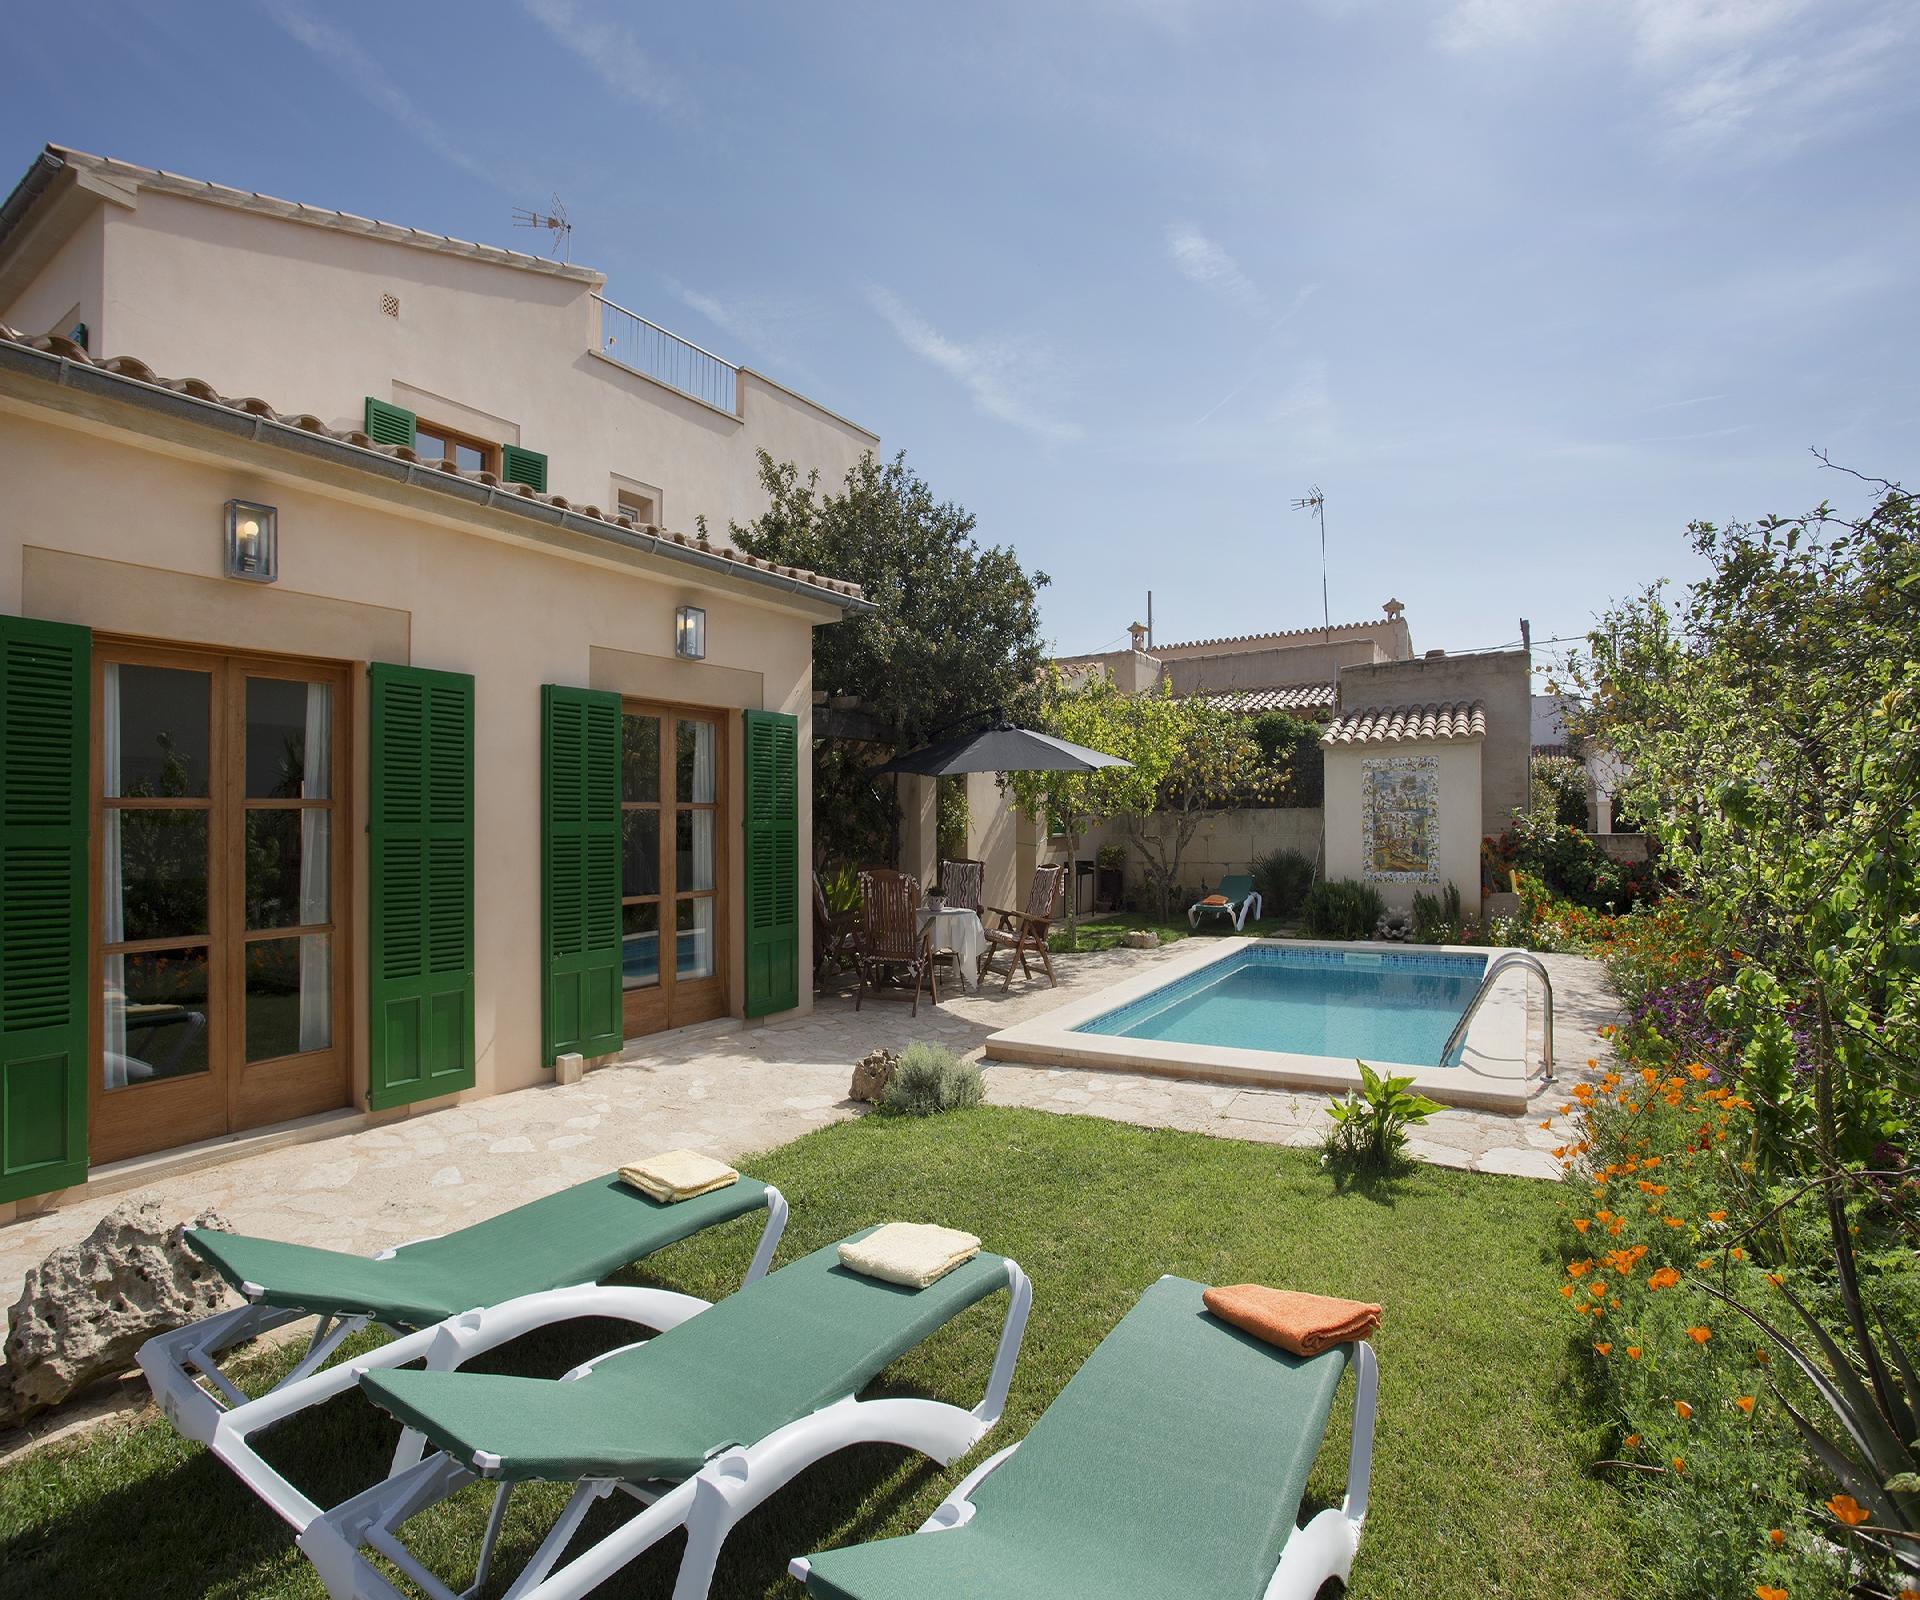 Ferienhaus mit Privatpool für 6 Personen ca 90 m² in Sa Rapita Mallorca Südküste von Mallorca